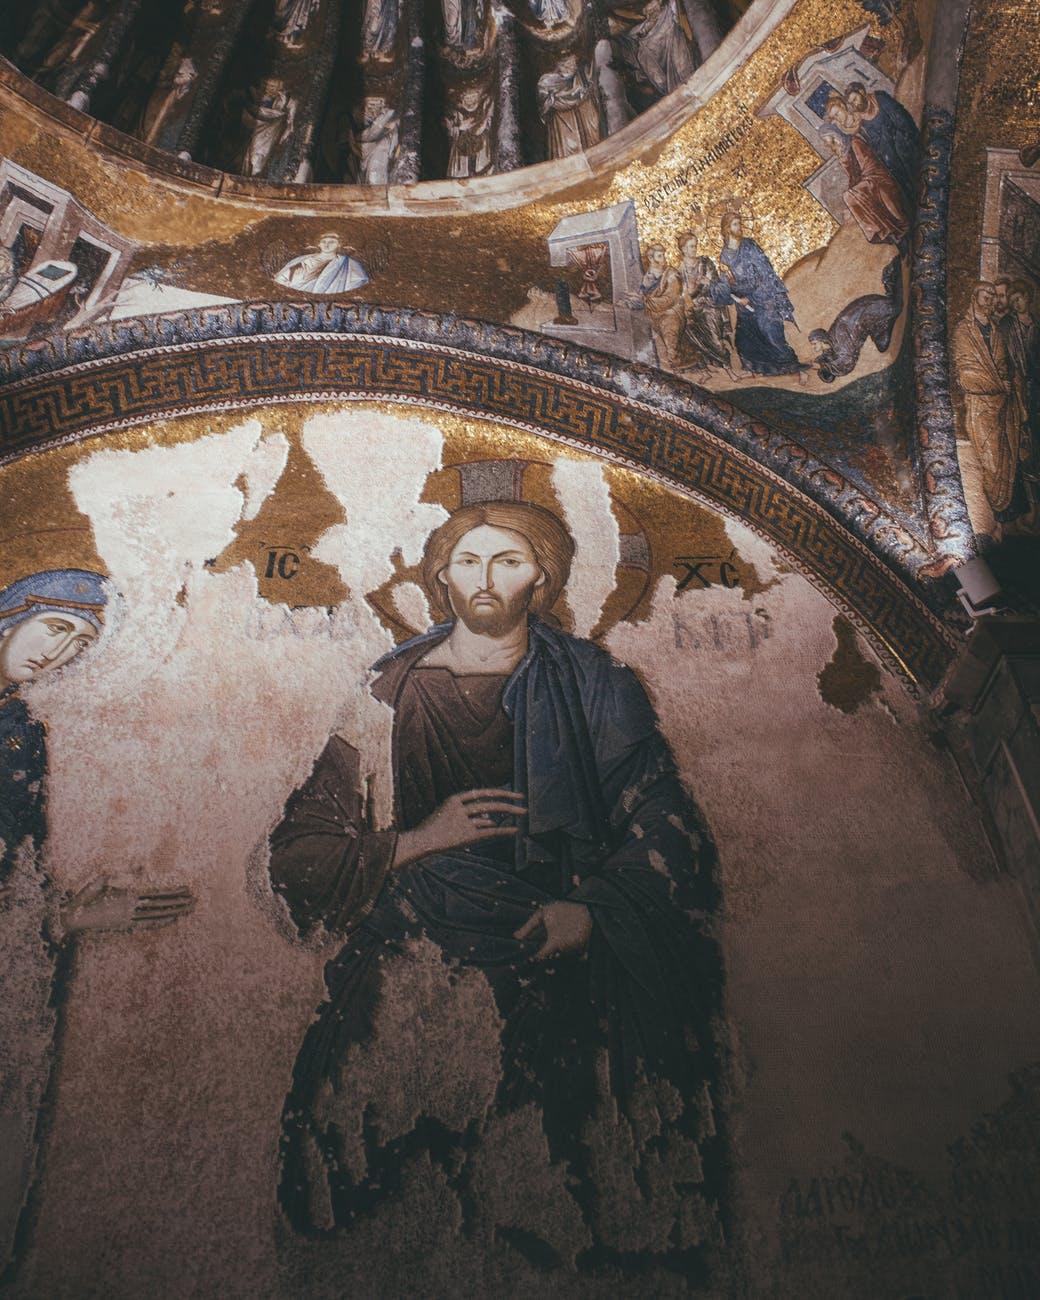 Image of Jesus the Christ